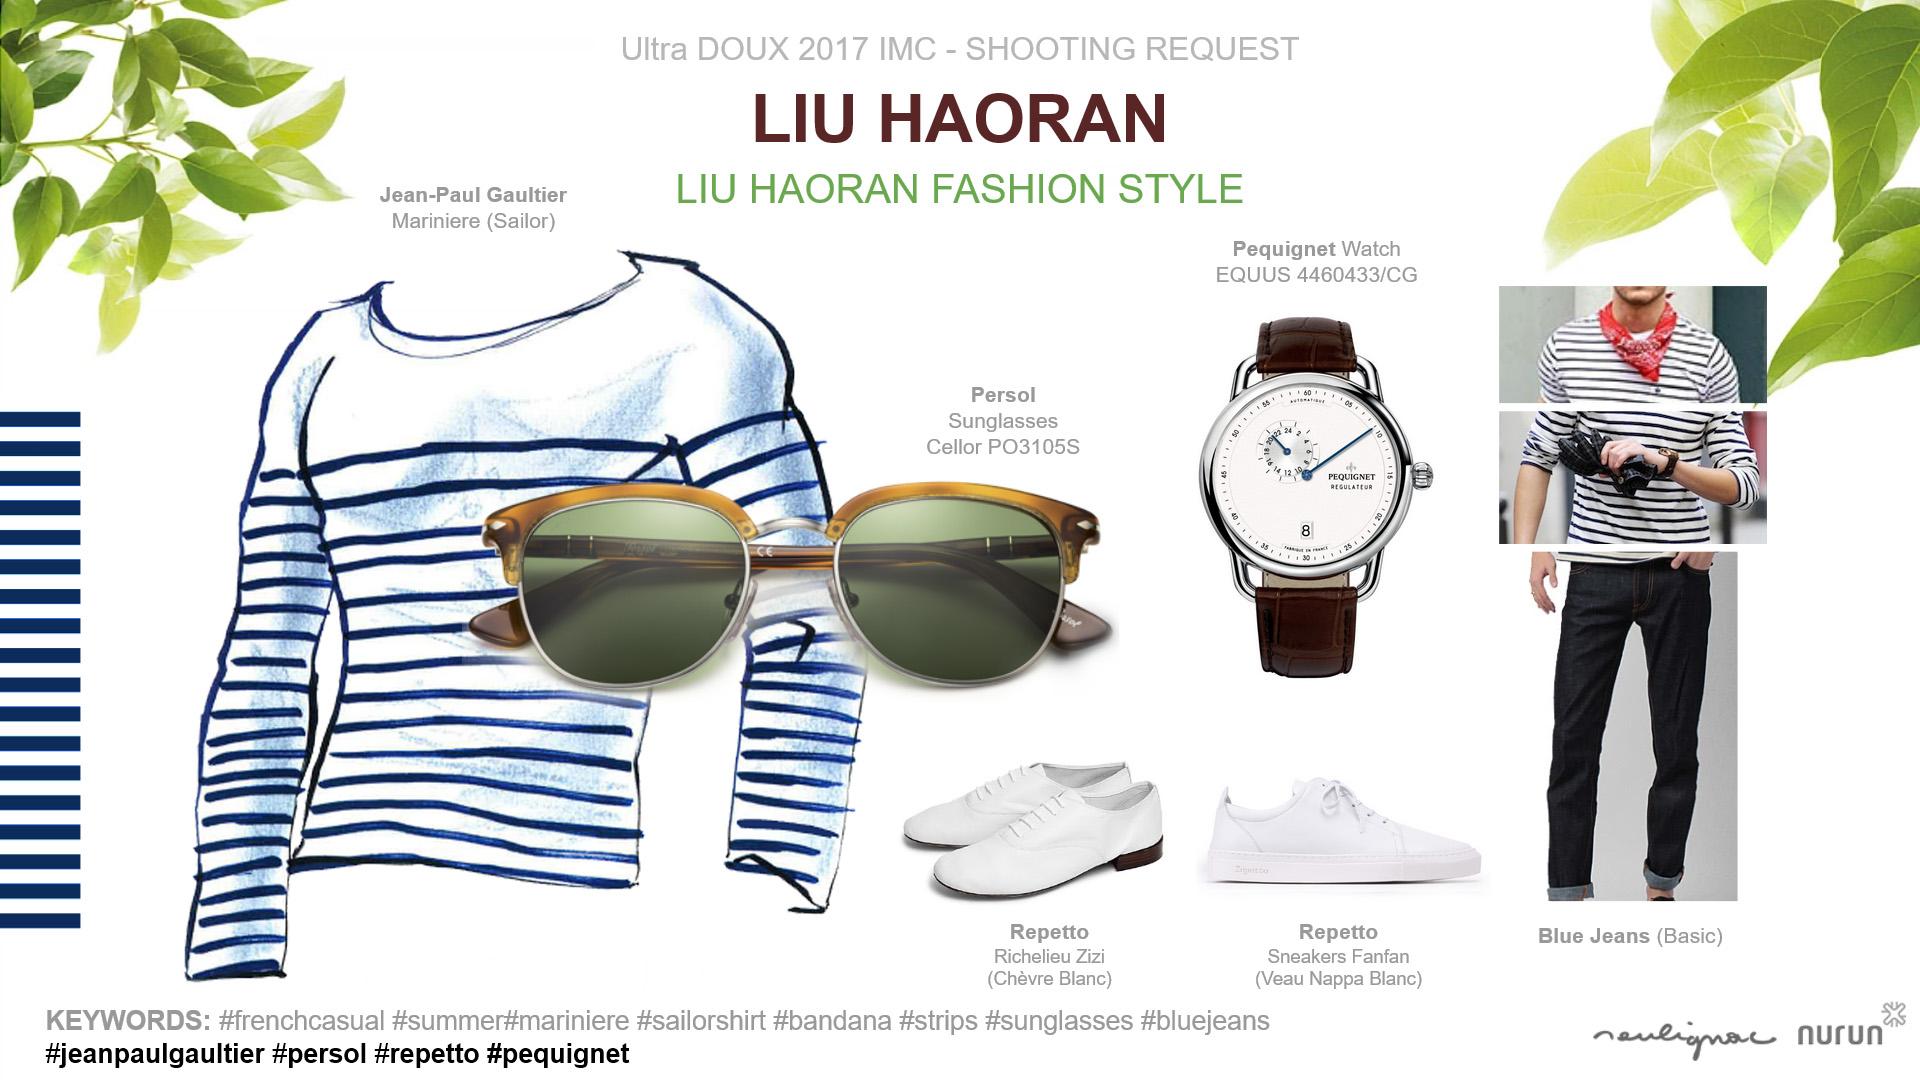 L'Oréal China - Garnier Ultra DOUX - Liu Haoran in France - FASHION STYLE - Francois Soulignac - Nurun Publicis Shanghai